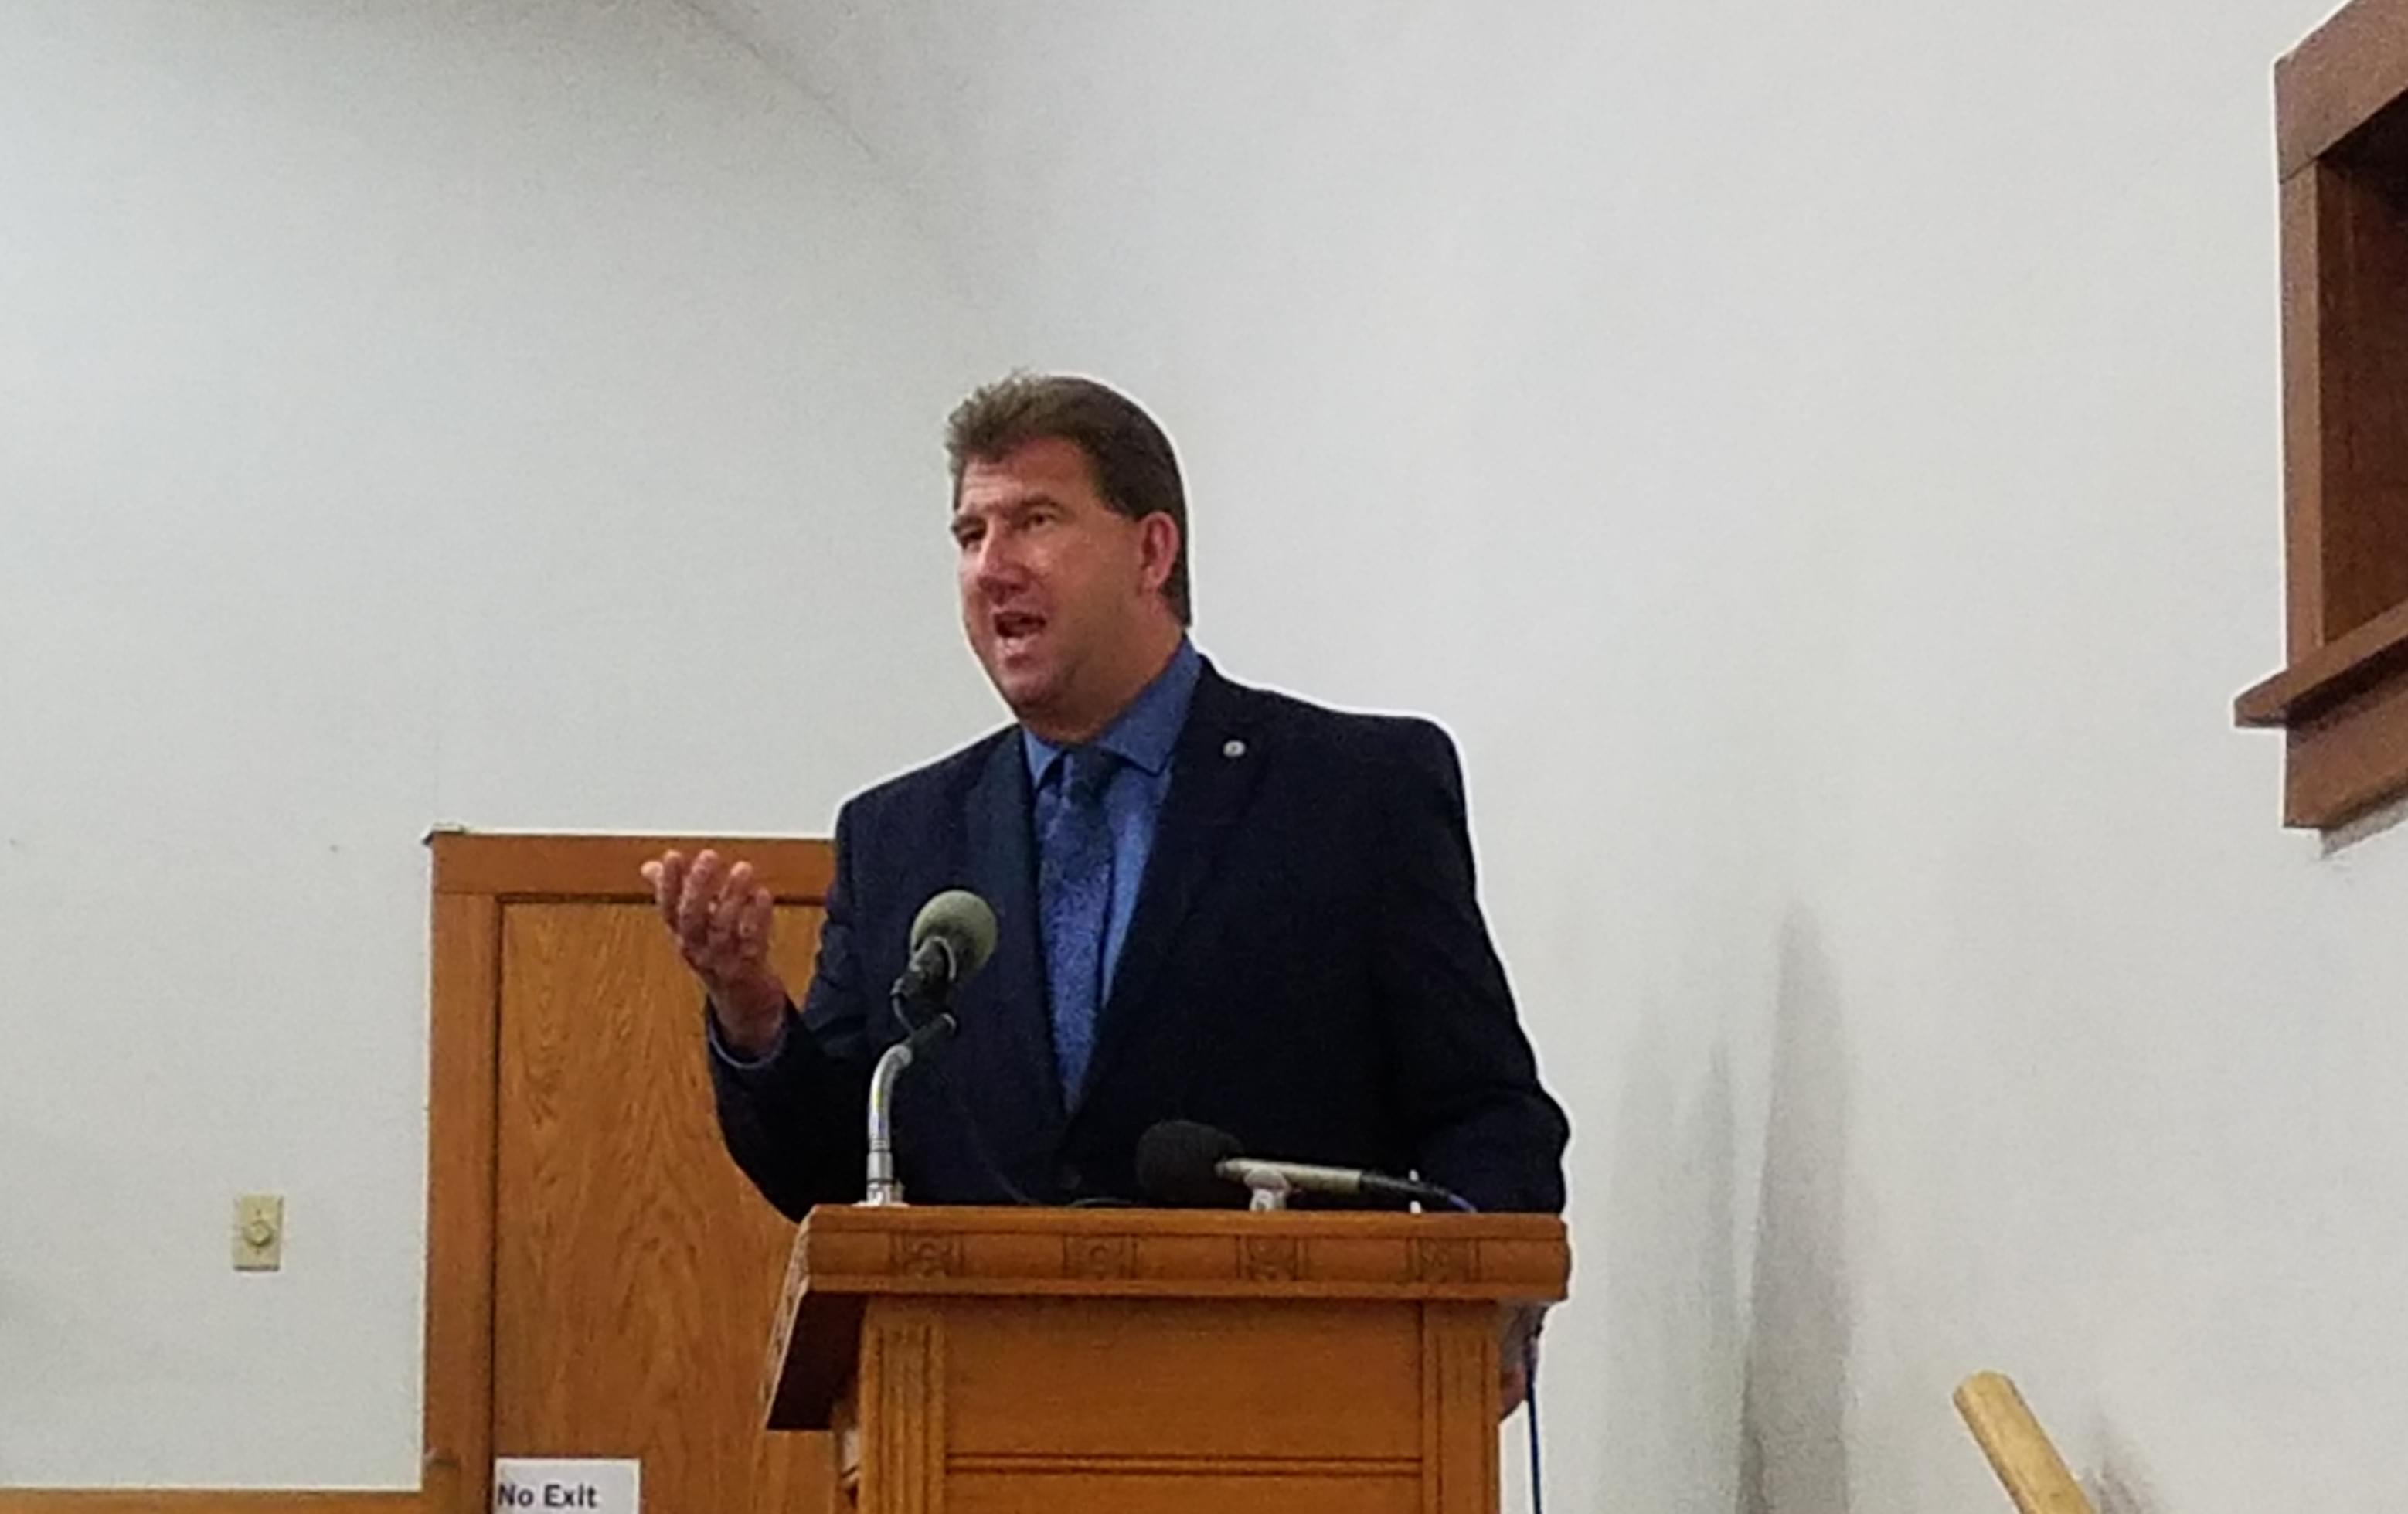 Danville Mayor Scott Eisenhauer